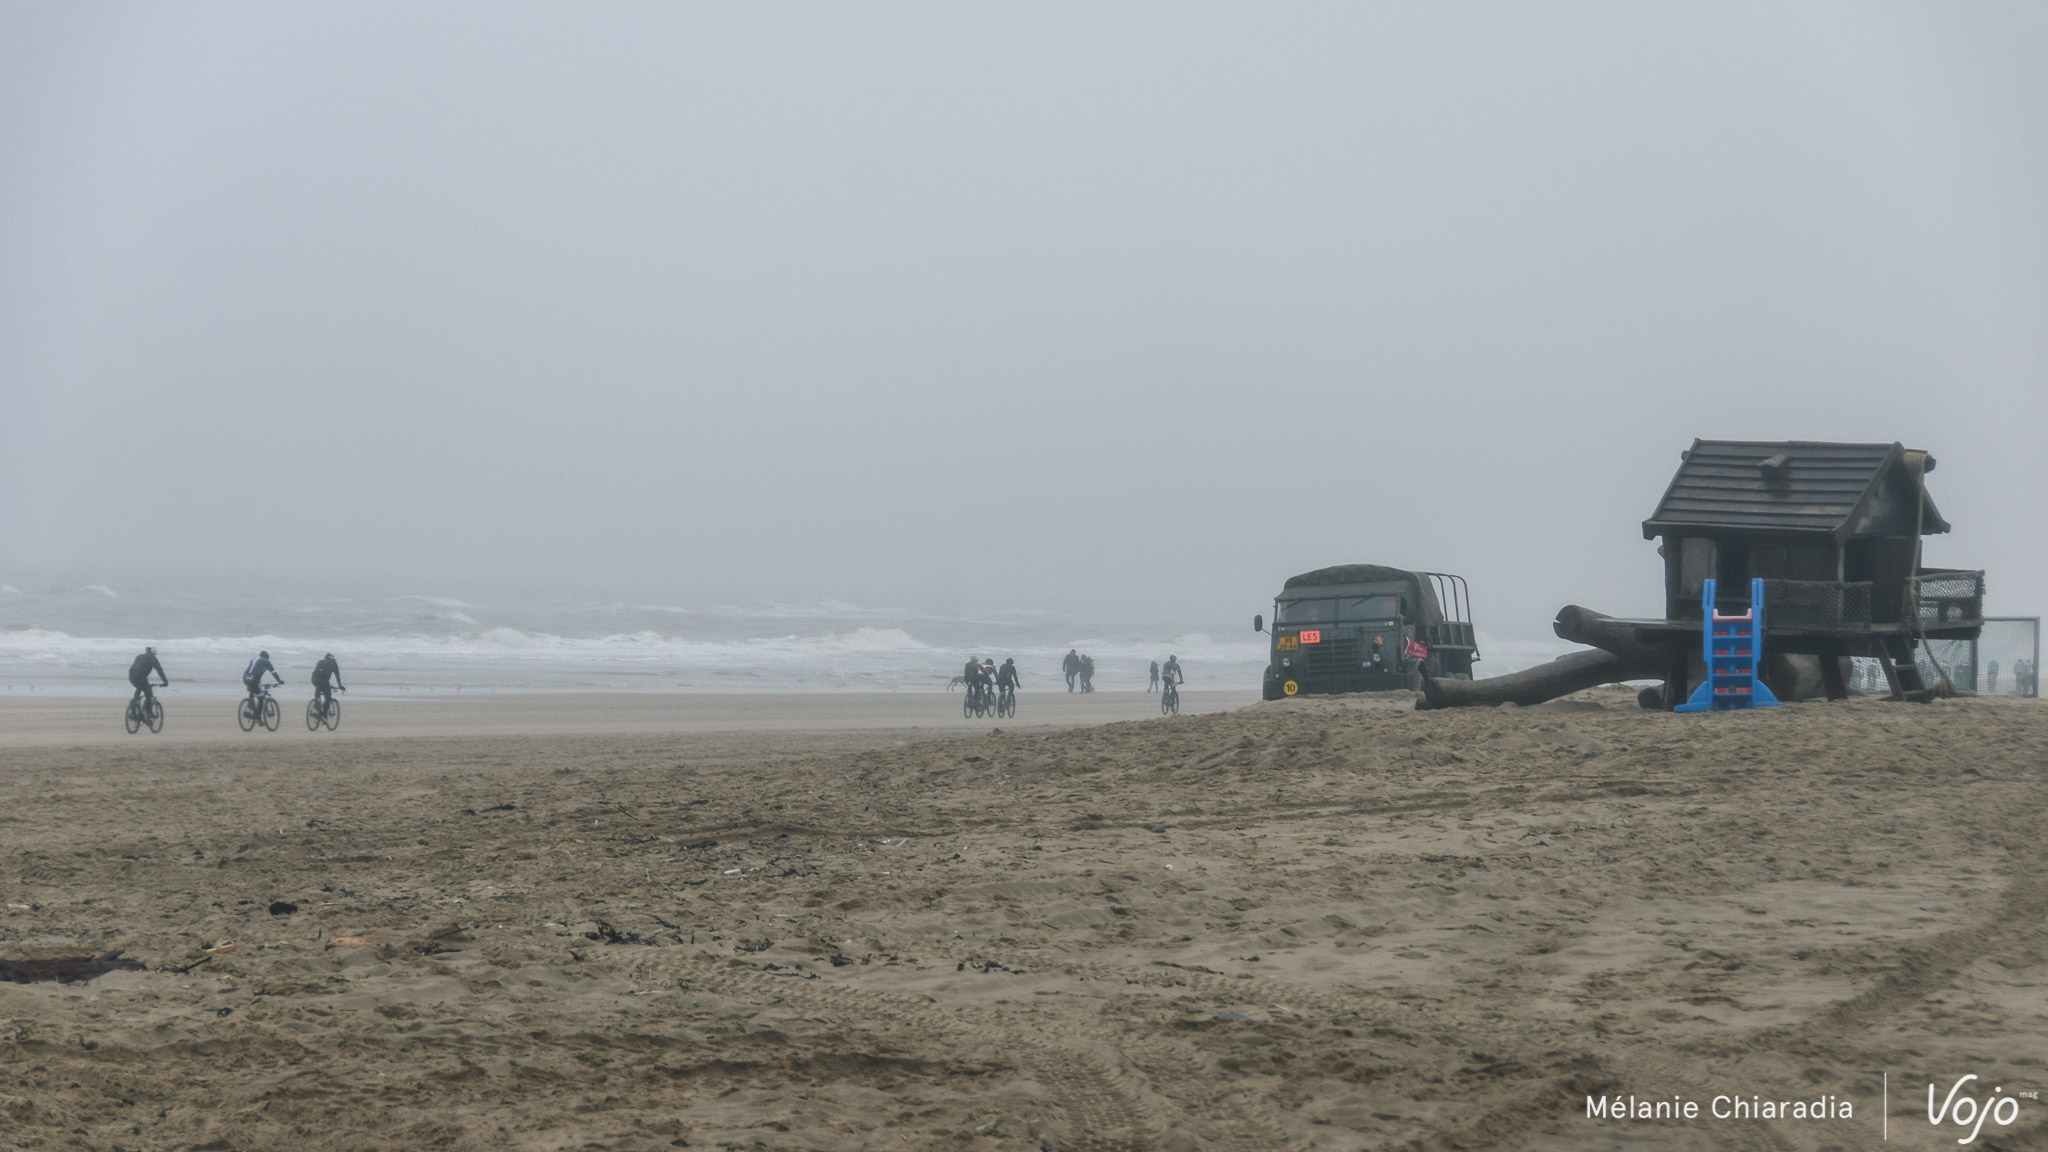 beachrace_egmond_pier_egmond_mel_copyright_obeart_vojomag-40